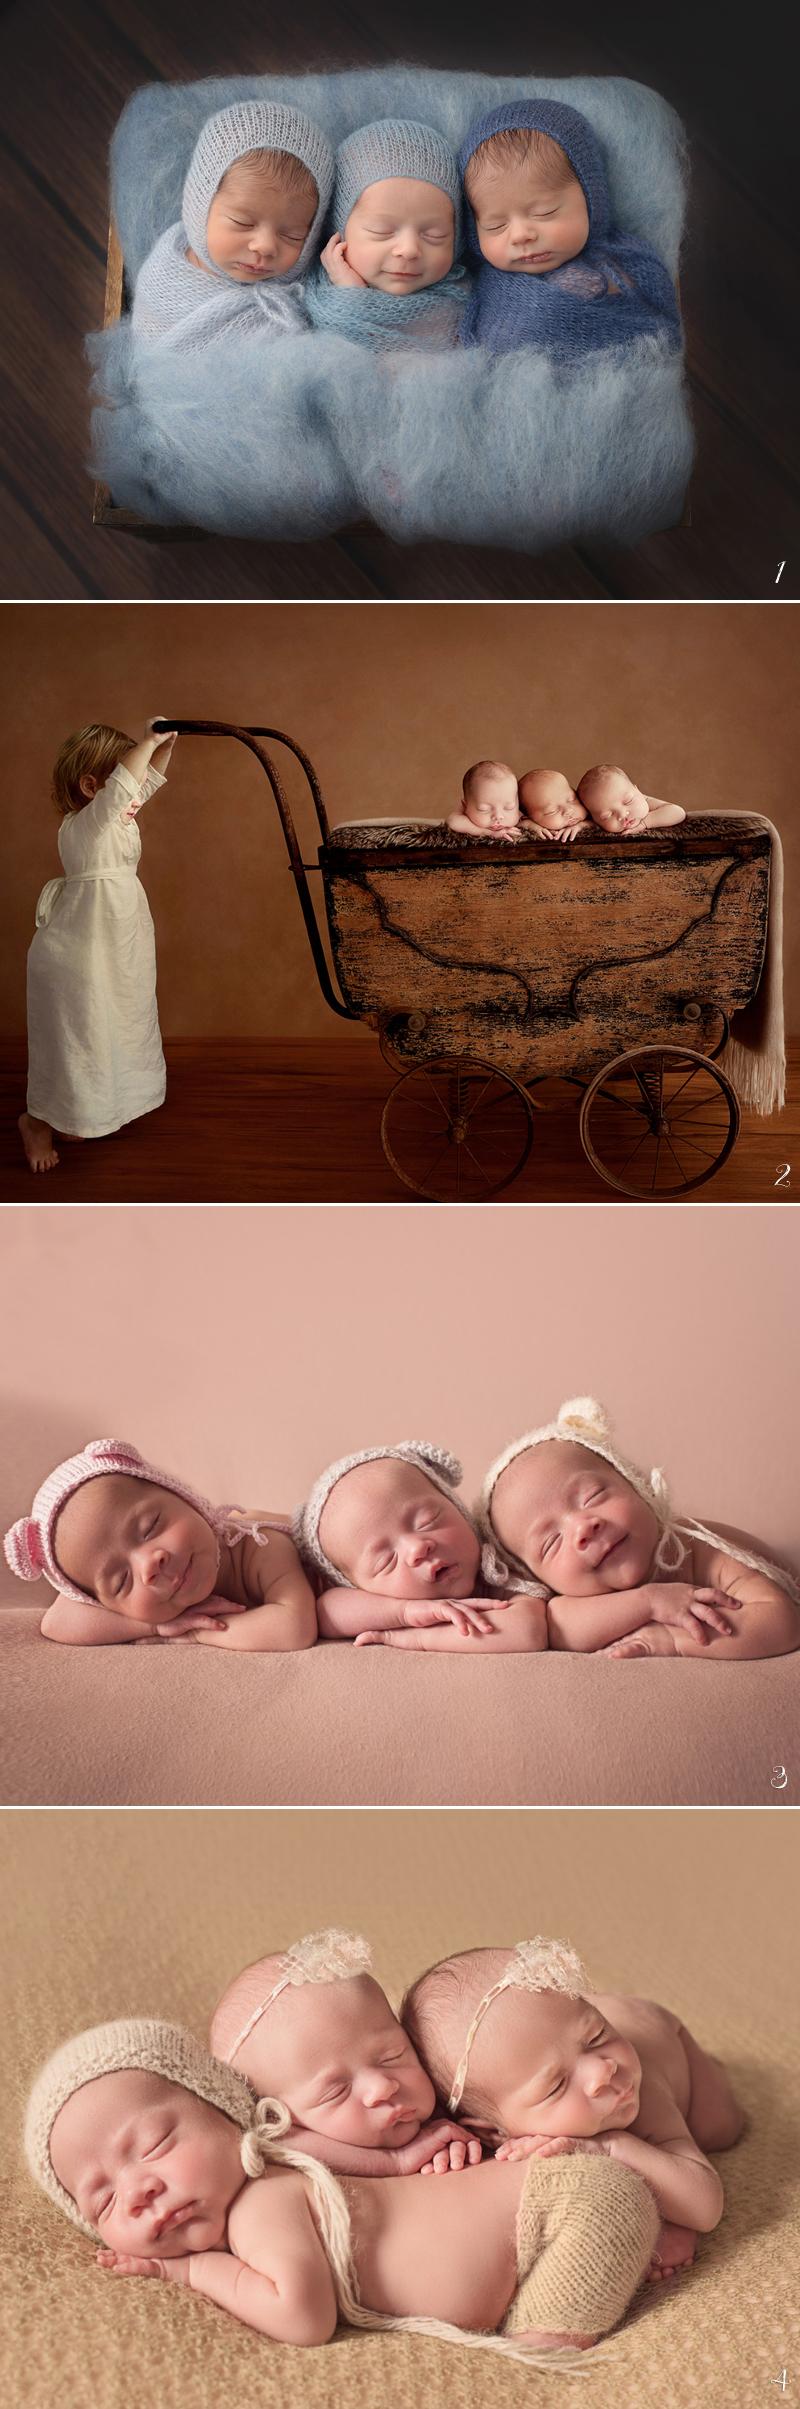 twins02-triplet